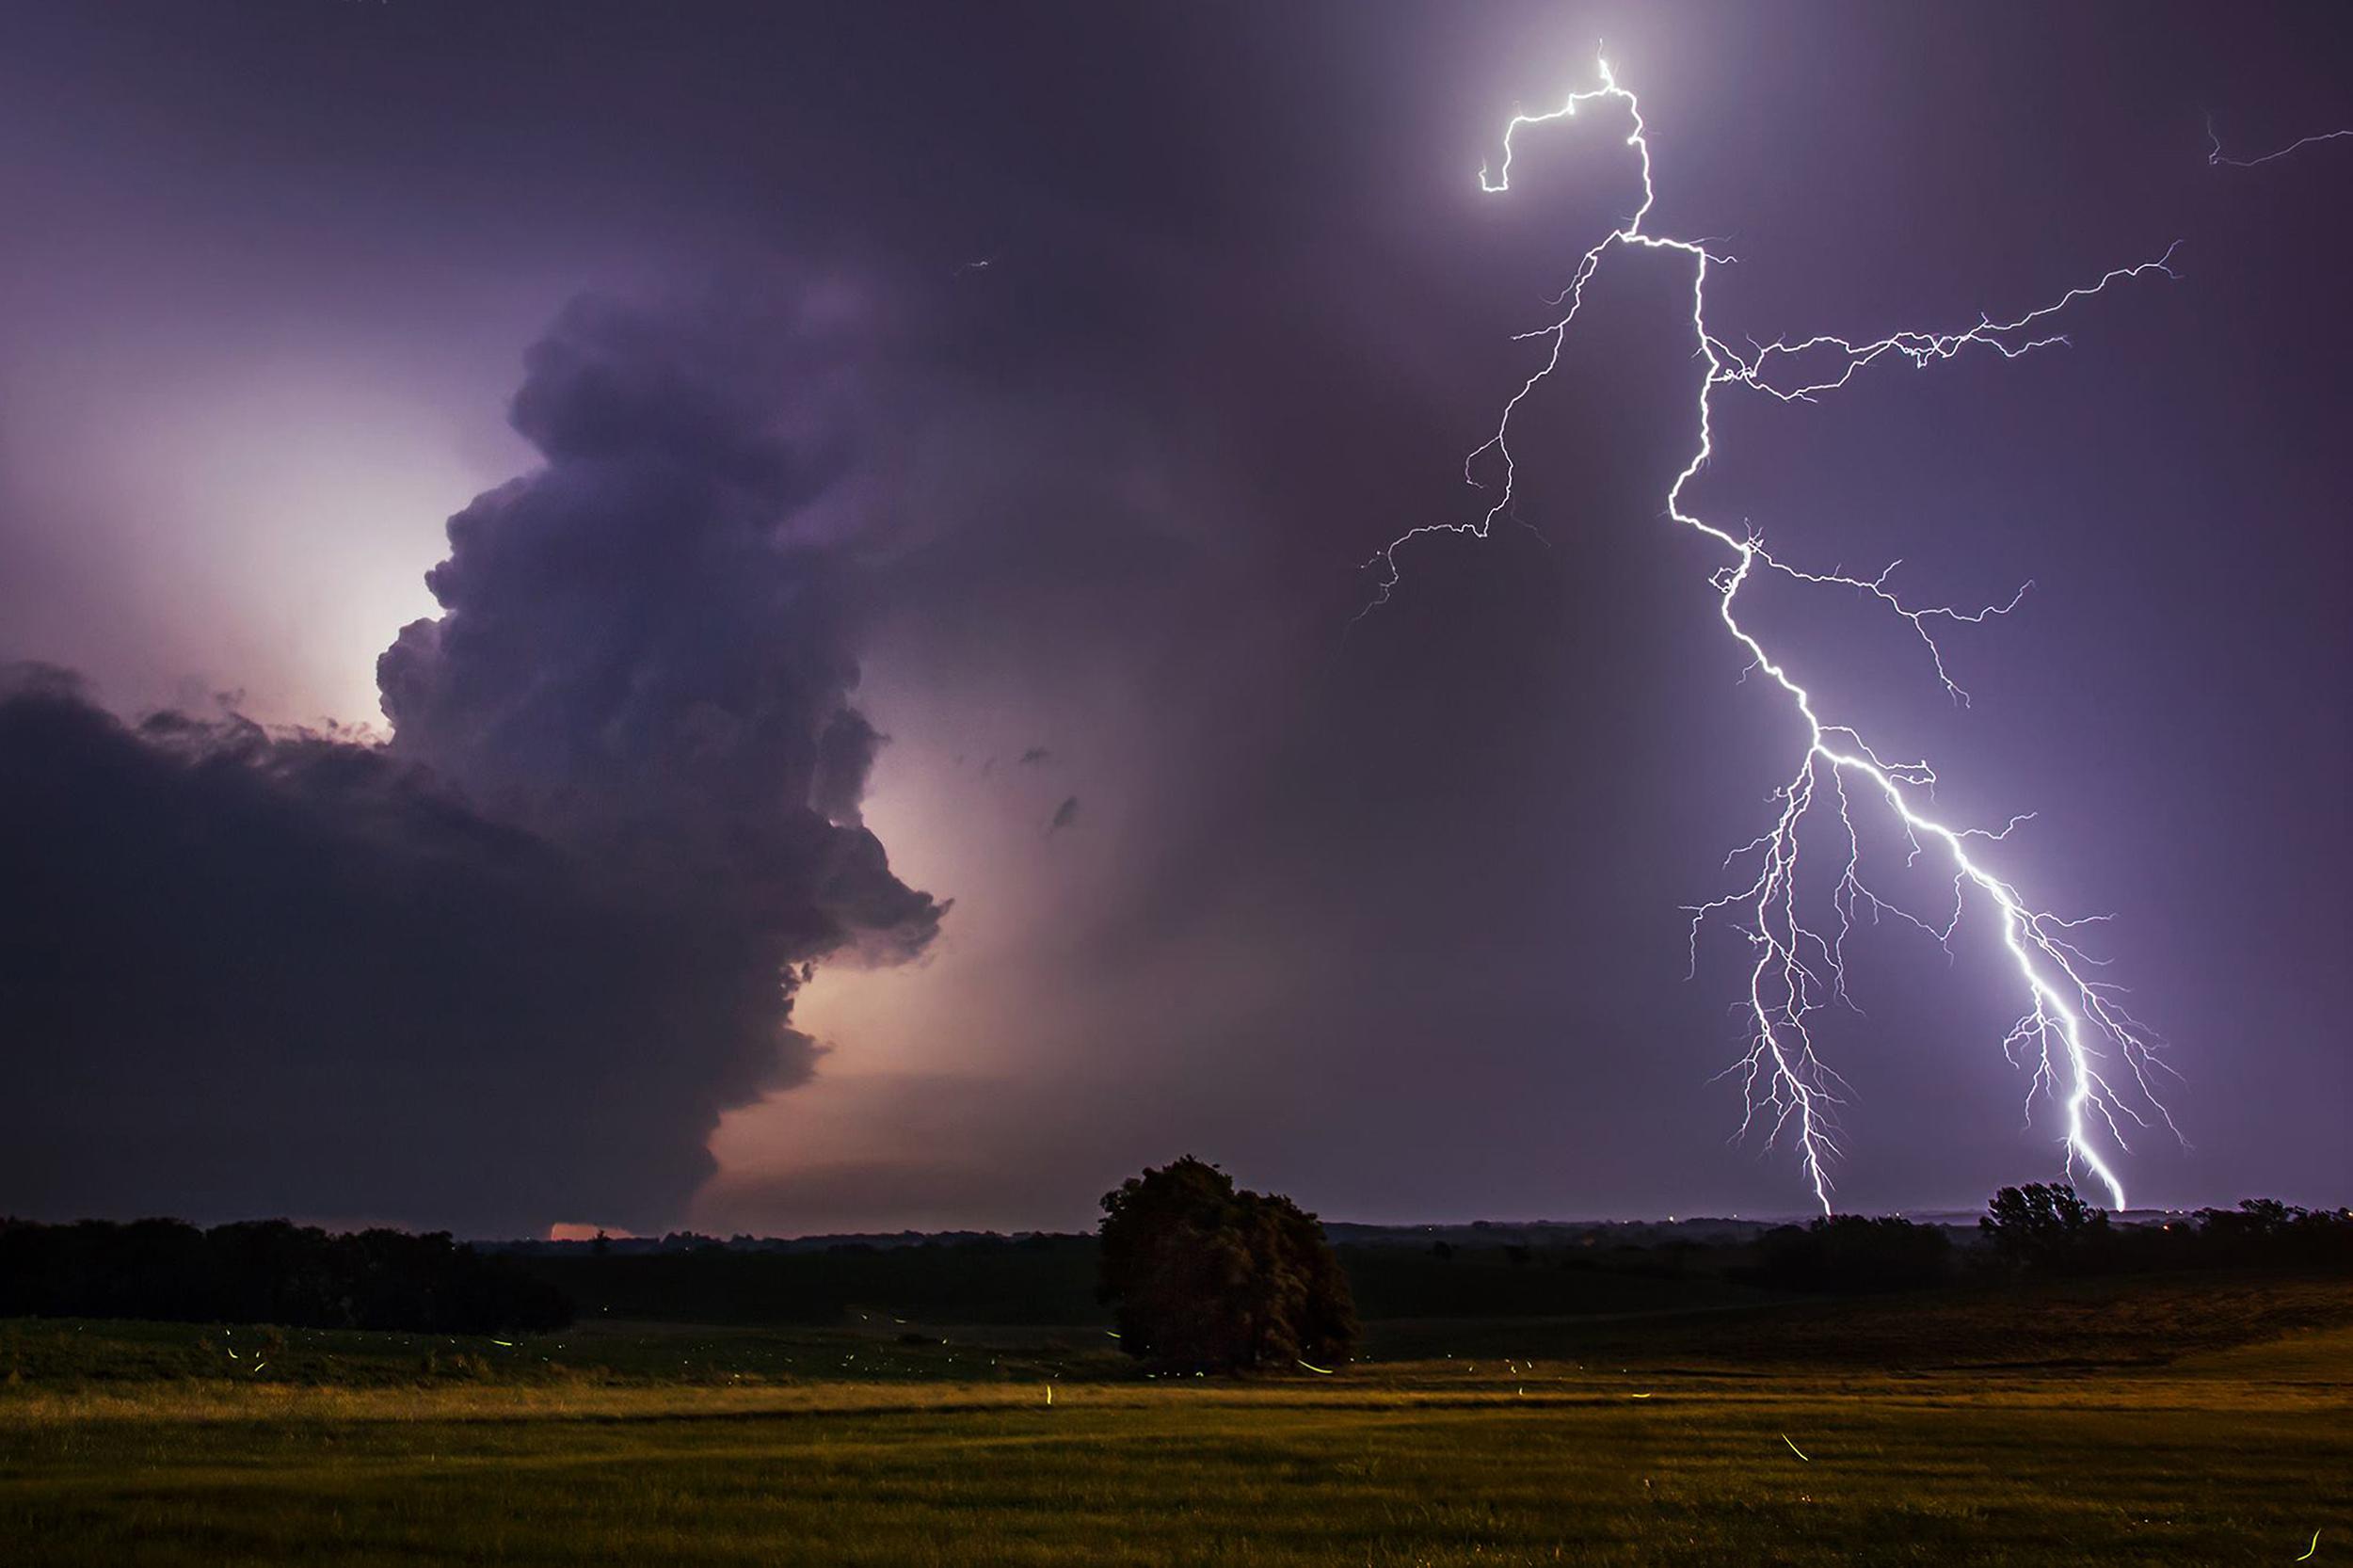 Mesocyclone and +CG lightning in Weston, Missouri on June 29, 2014